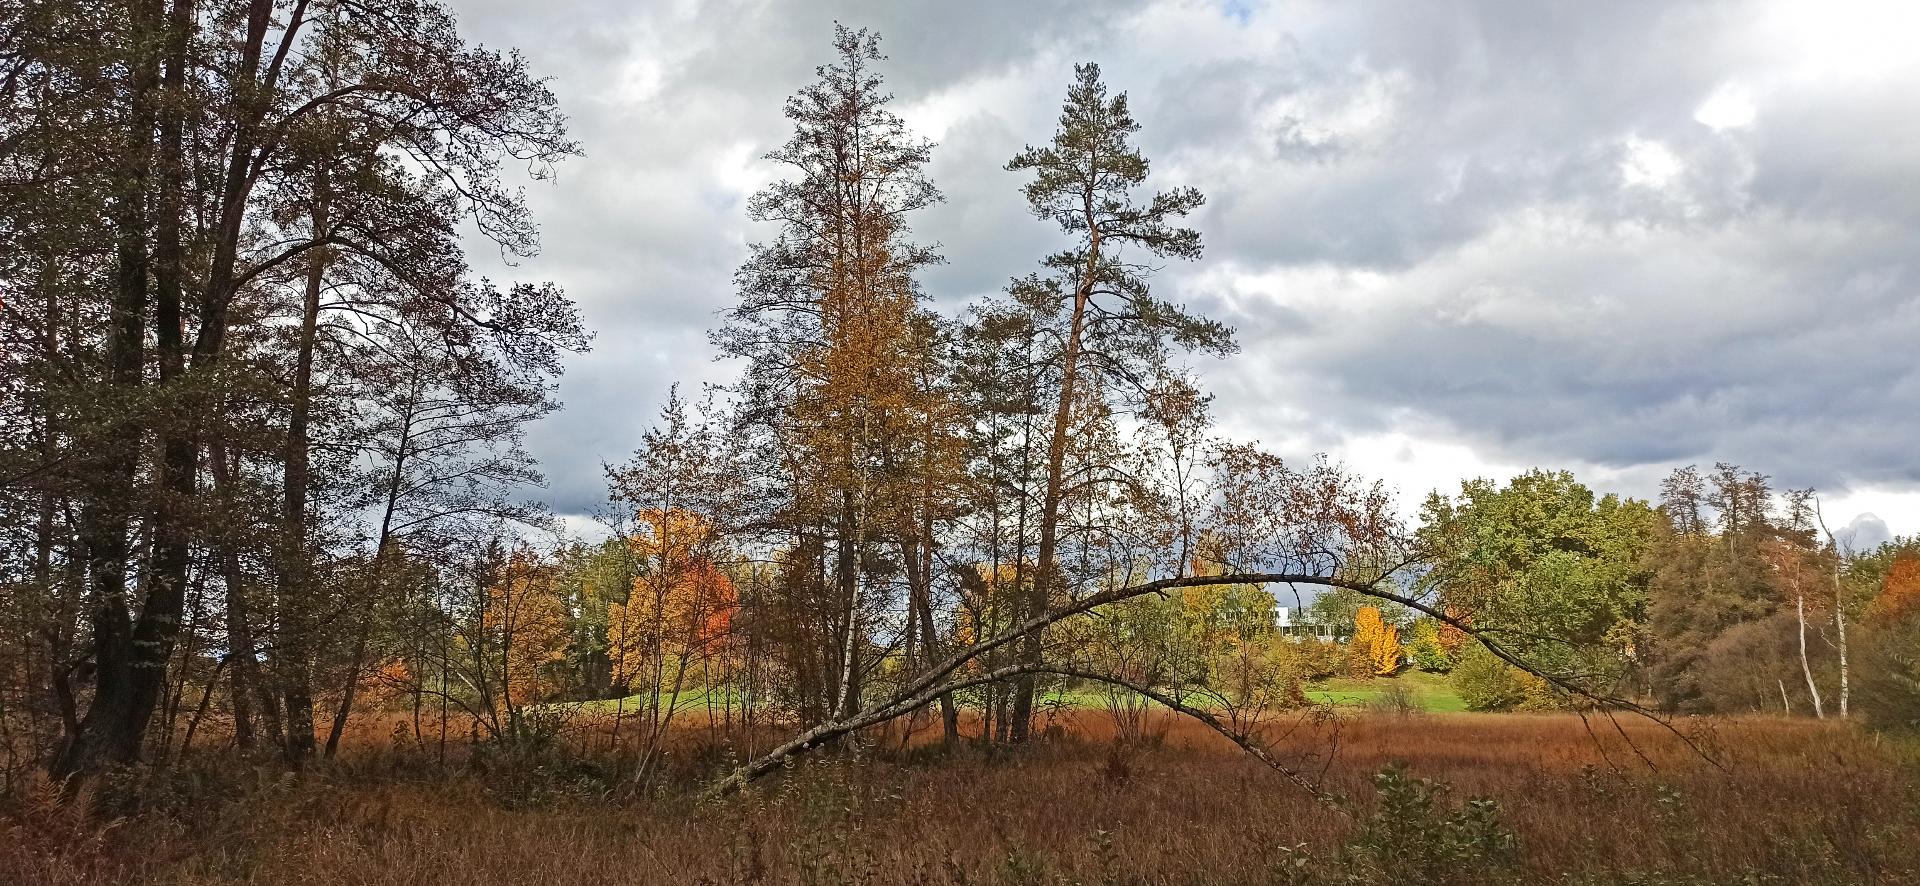 Schutzgebiet Flachmoor Chrutzelried